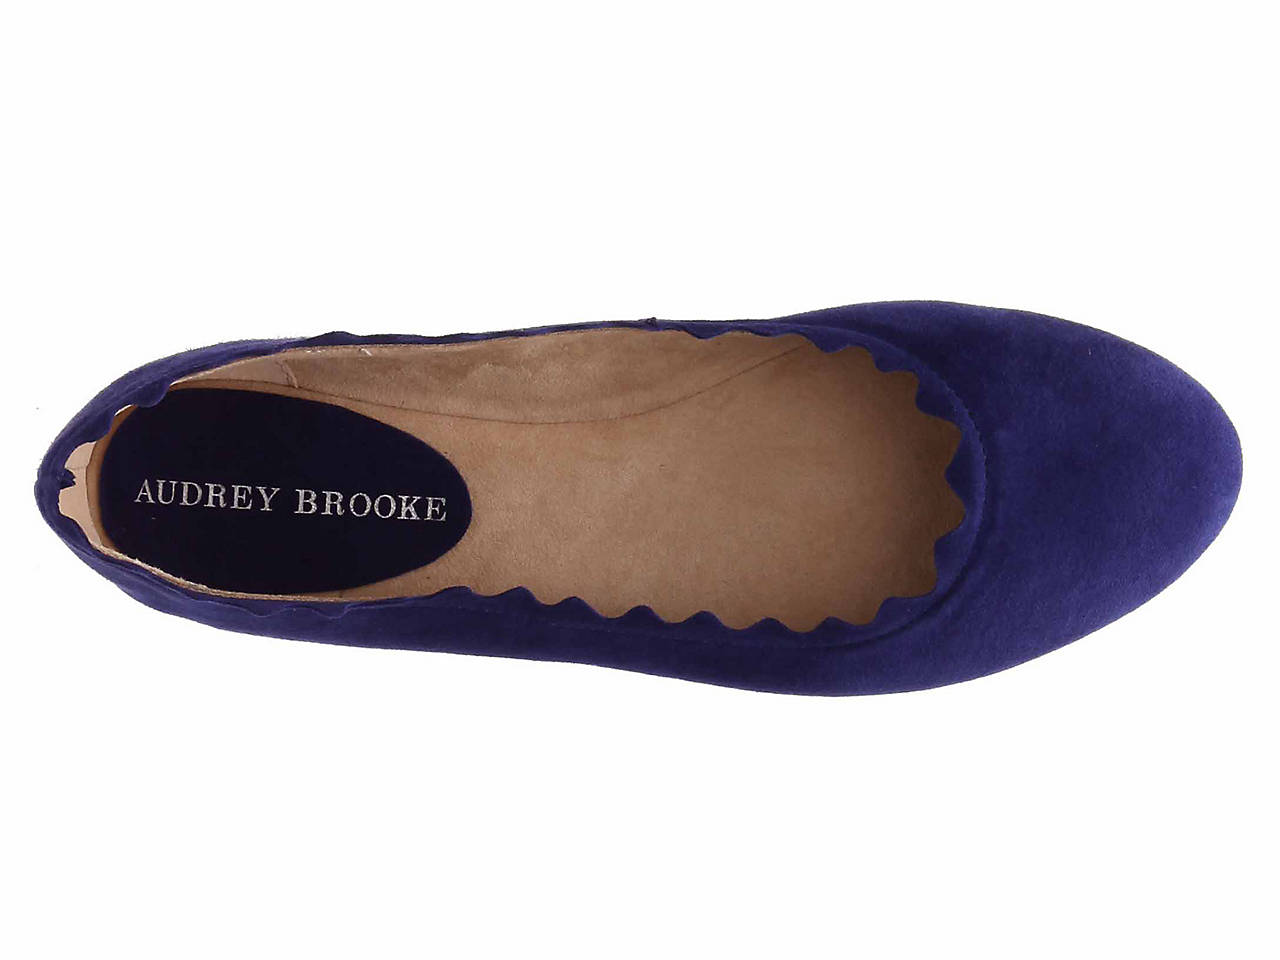 455e6a41d9a83 Audrey Brooke Winny Ballet Flat Women s Shoes